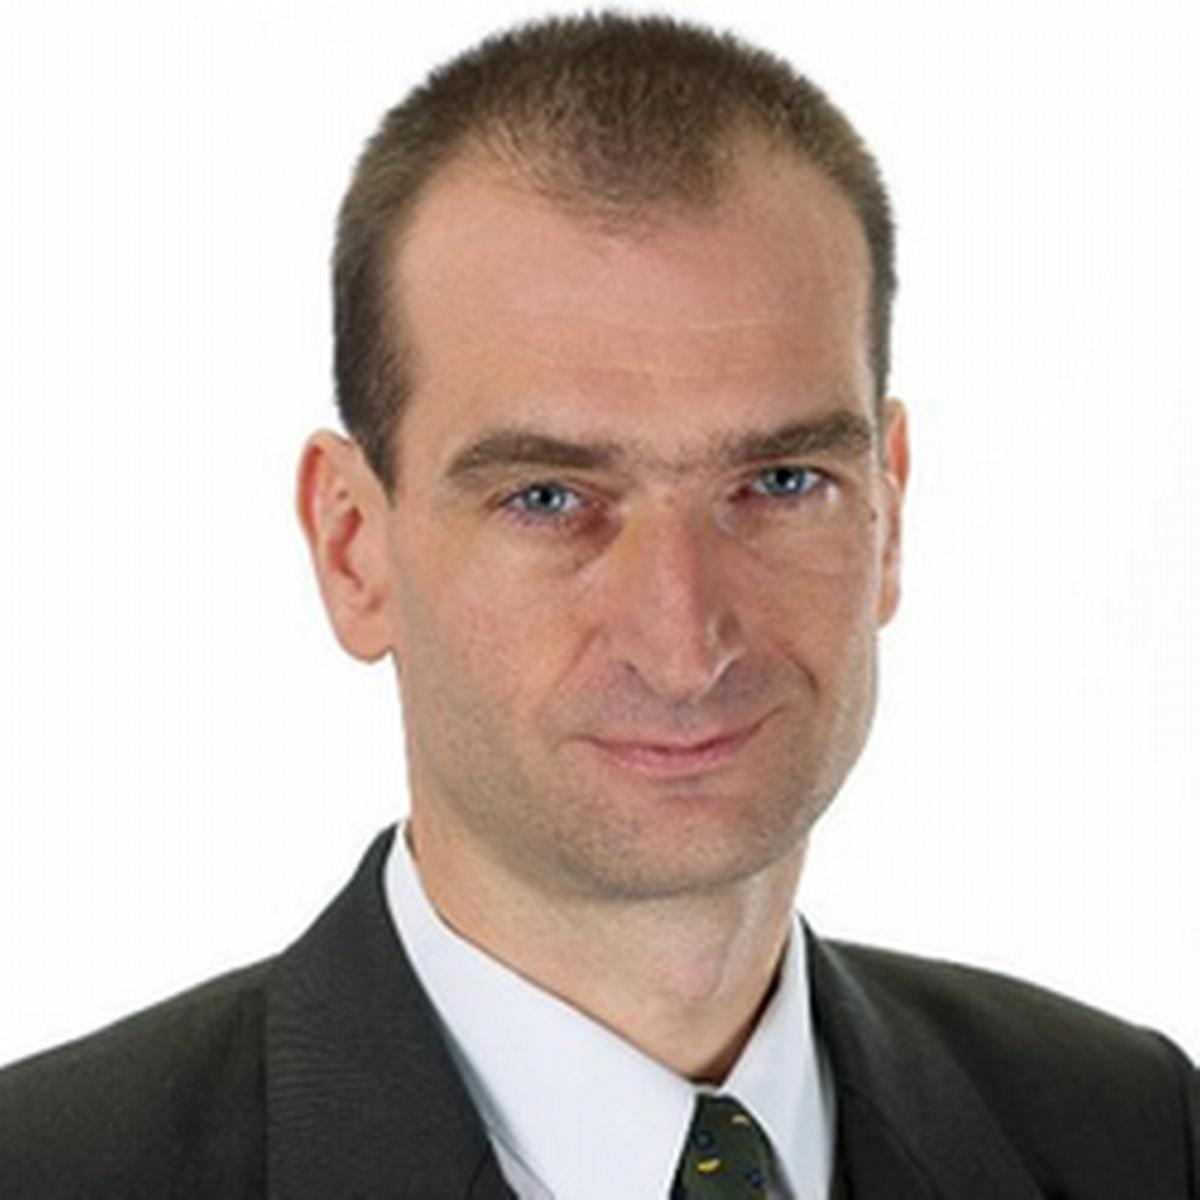 Jiří Denk, Altego